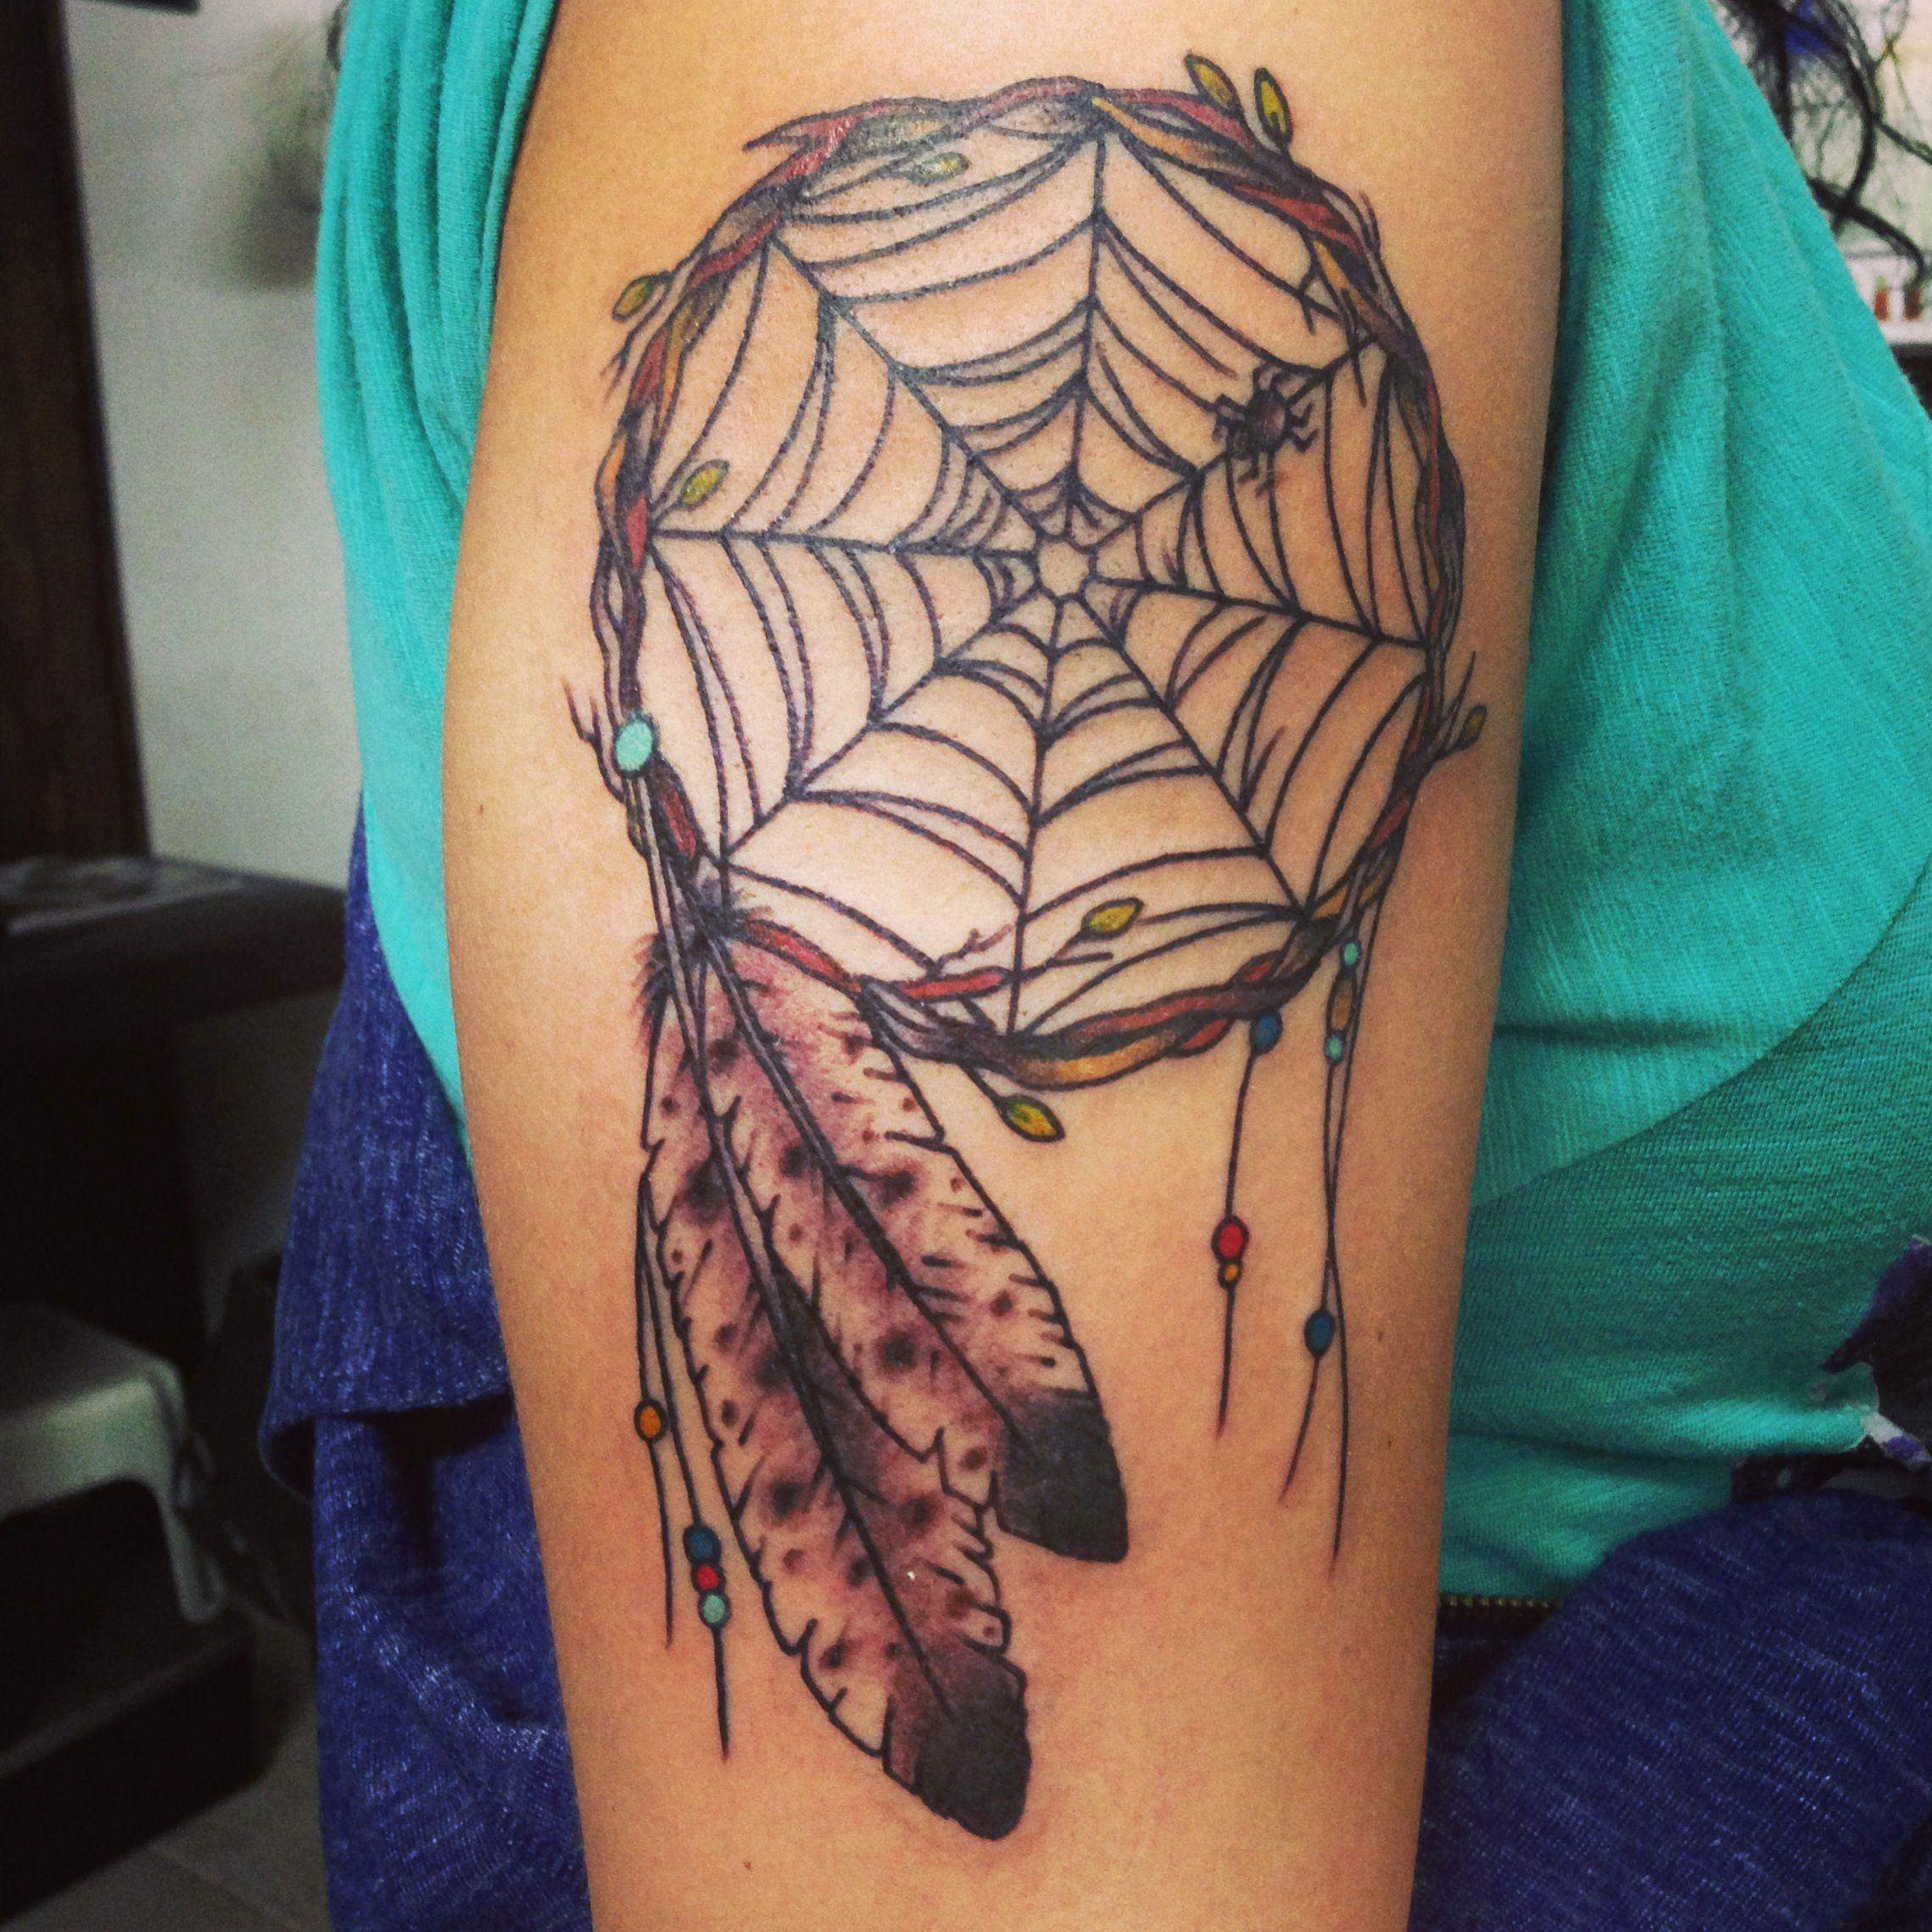 Dream Catcher Tattoo: Dreamcatcher Tattoo On My Arm.